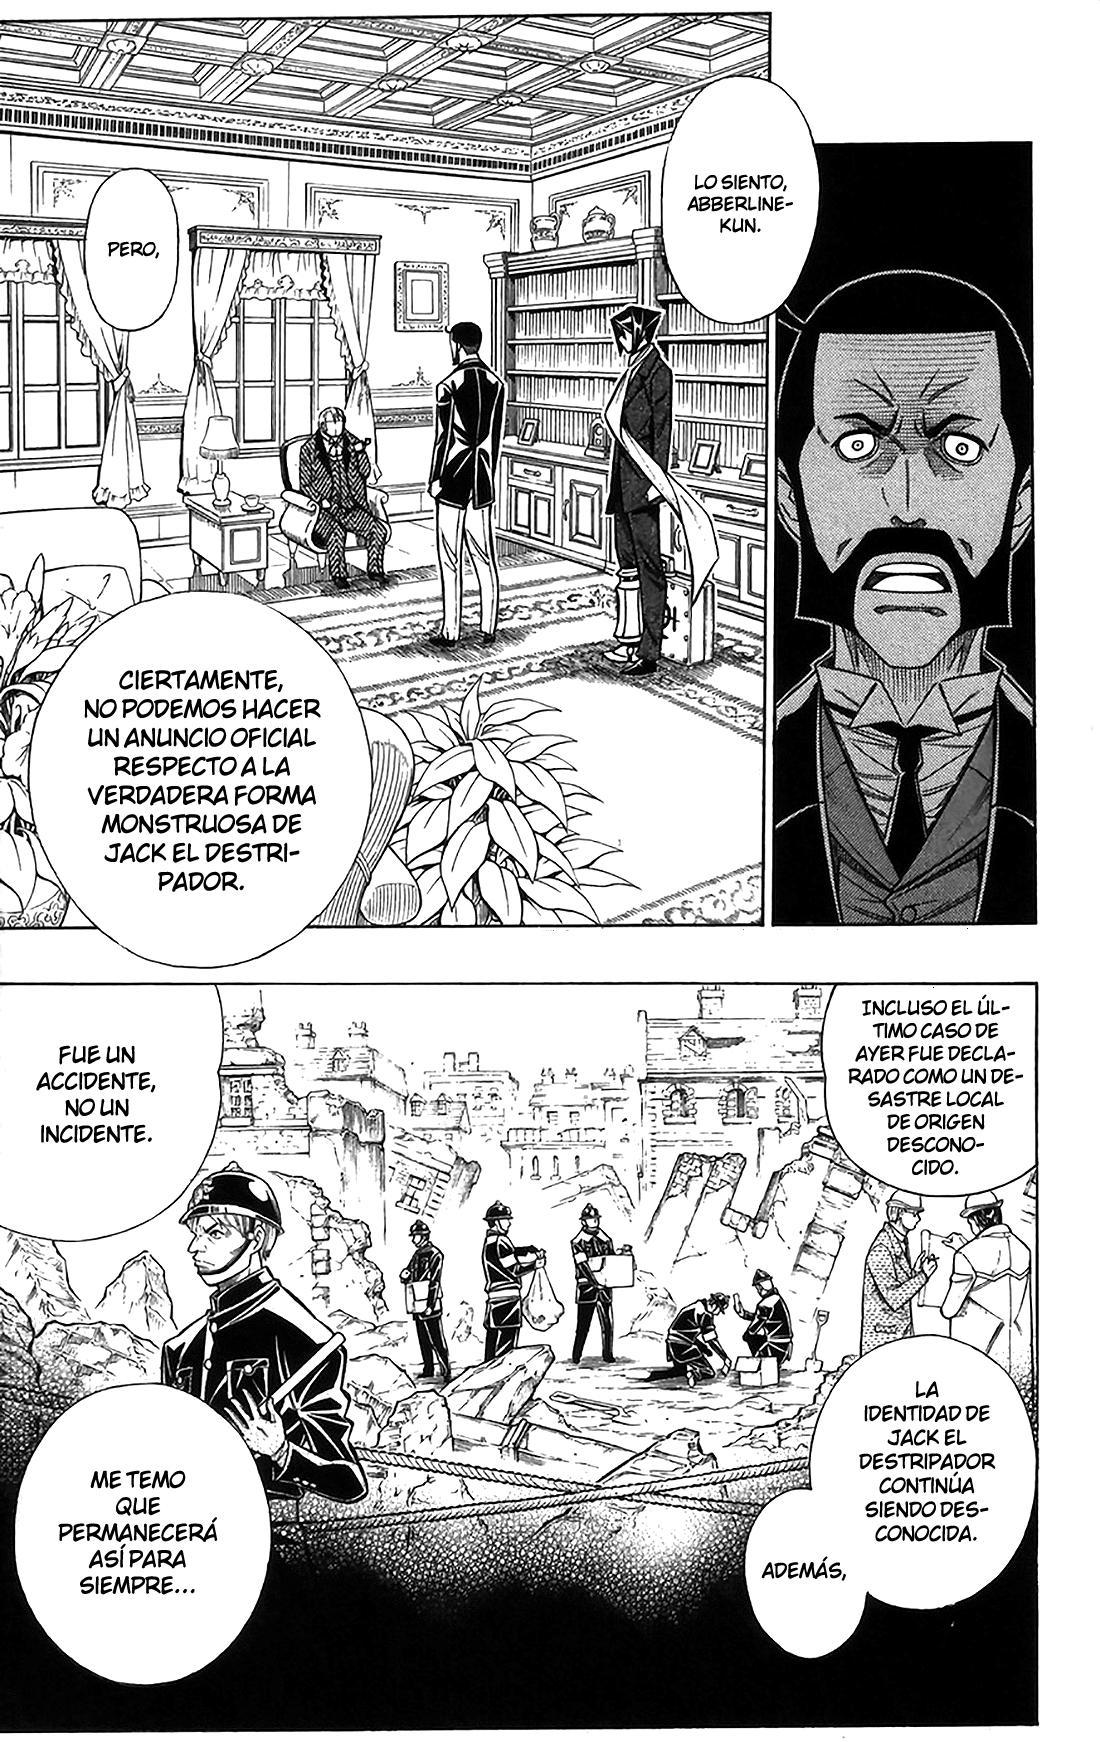 http://c5.ninemanga.com/es_manga/45/18797/447912/3946bb00df4eebe135aa471d36e6ef68.jpg Page 9